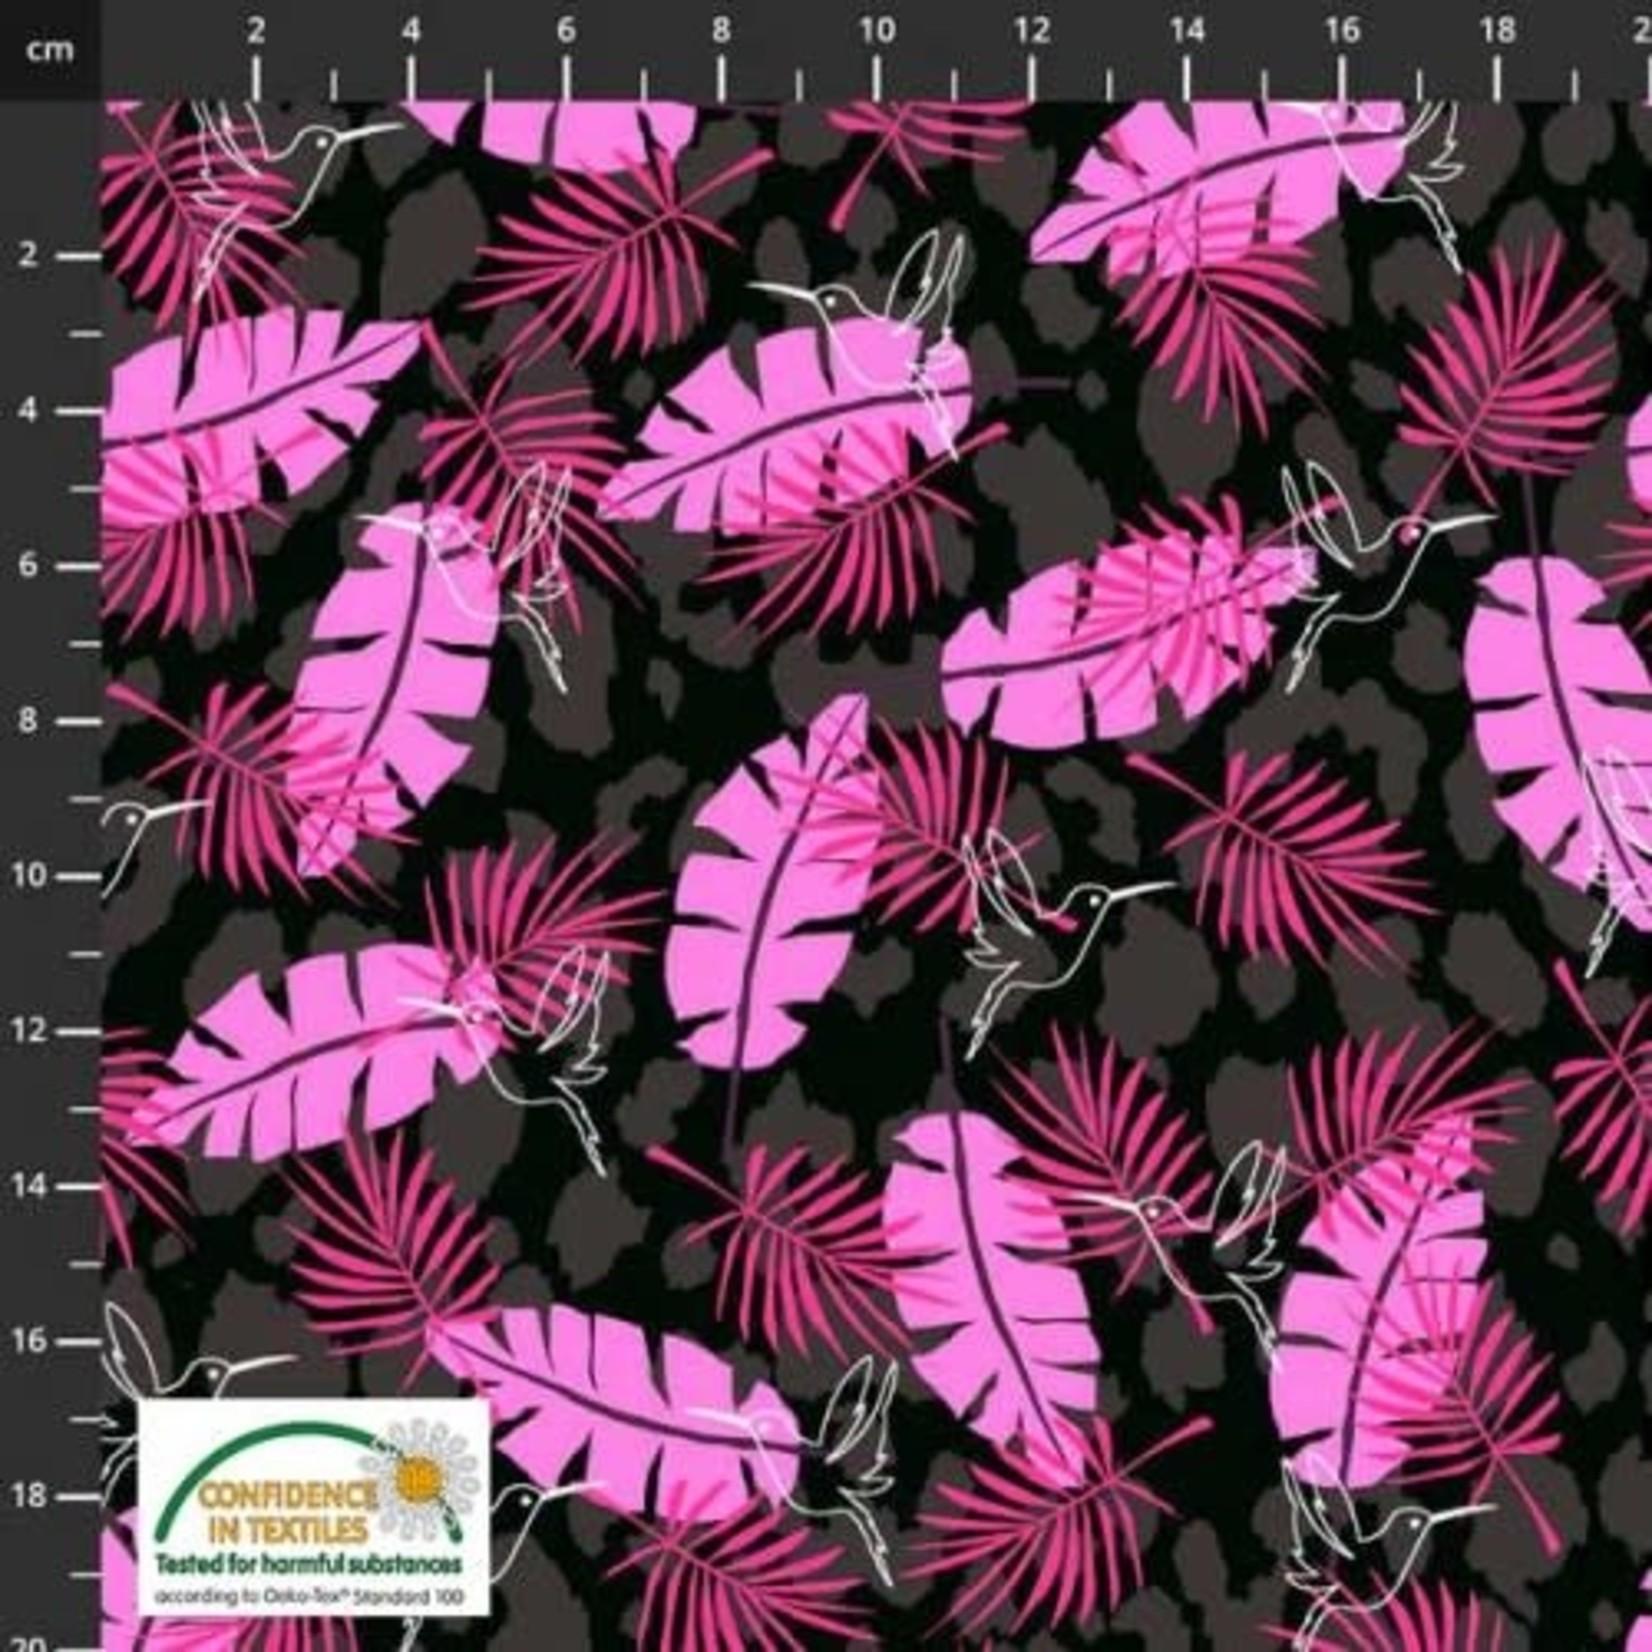 Stof Fabrics 4501-601 - Wild with the Wild - Black